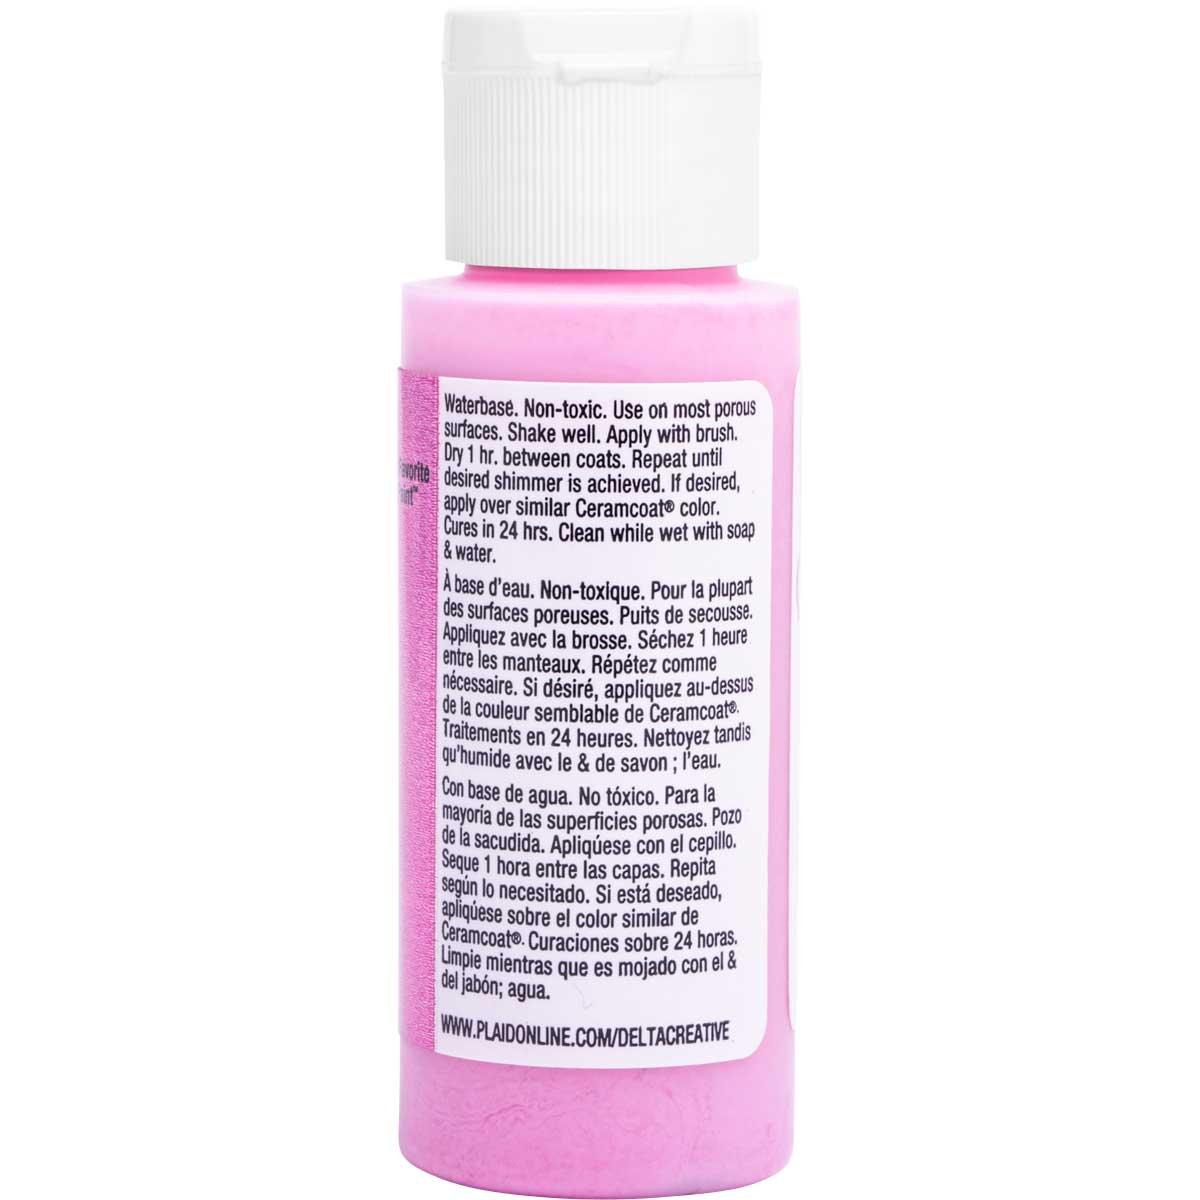 Delta Ceramcoat ® Acrylic Paint - Glitter Pink, 2 oz. - 03002